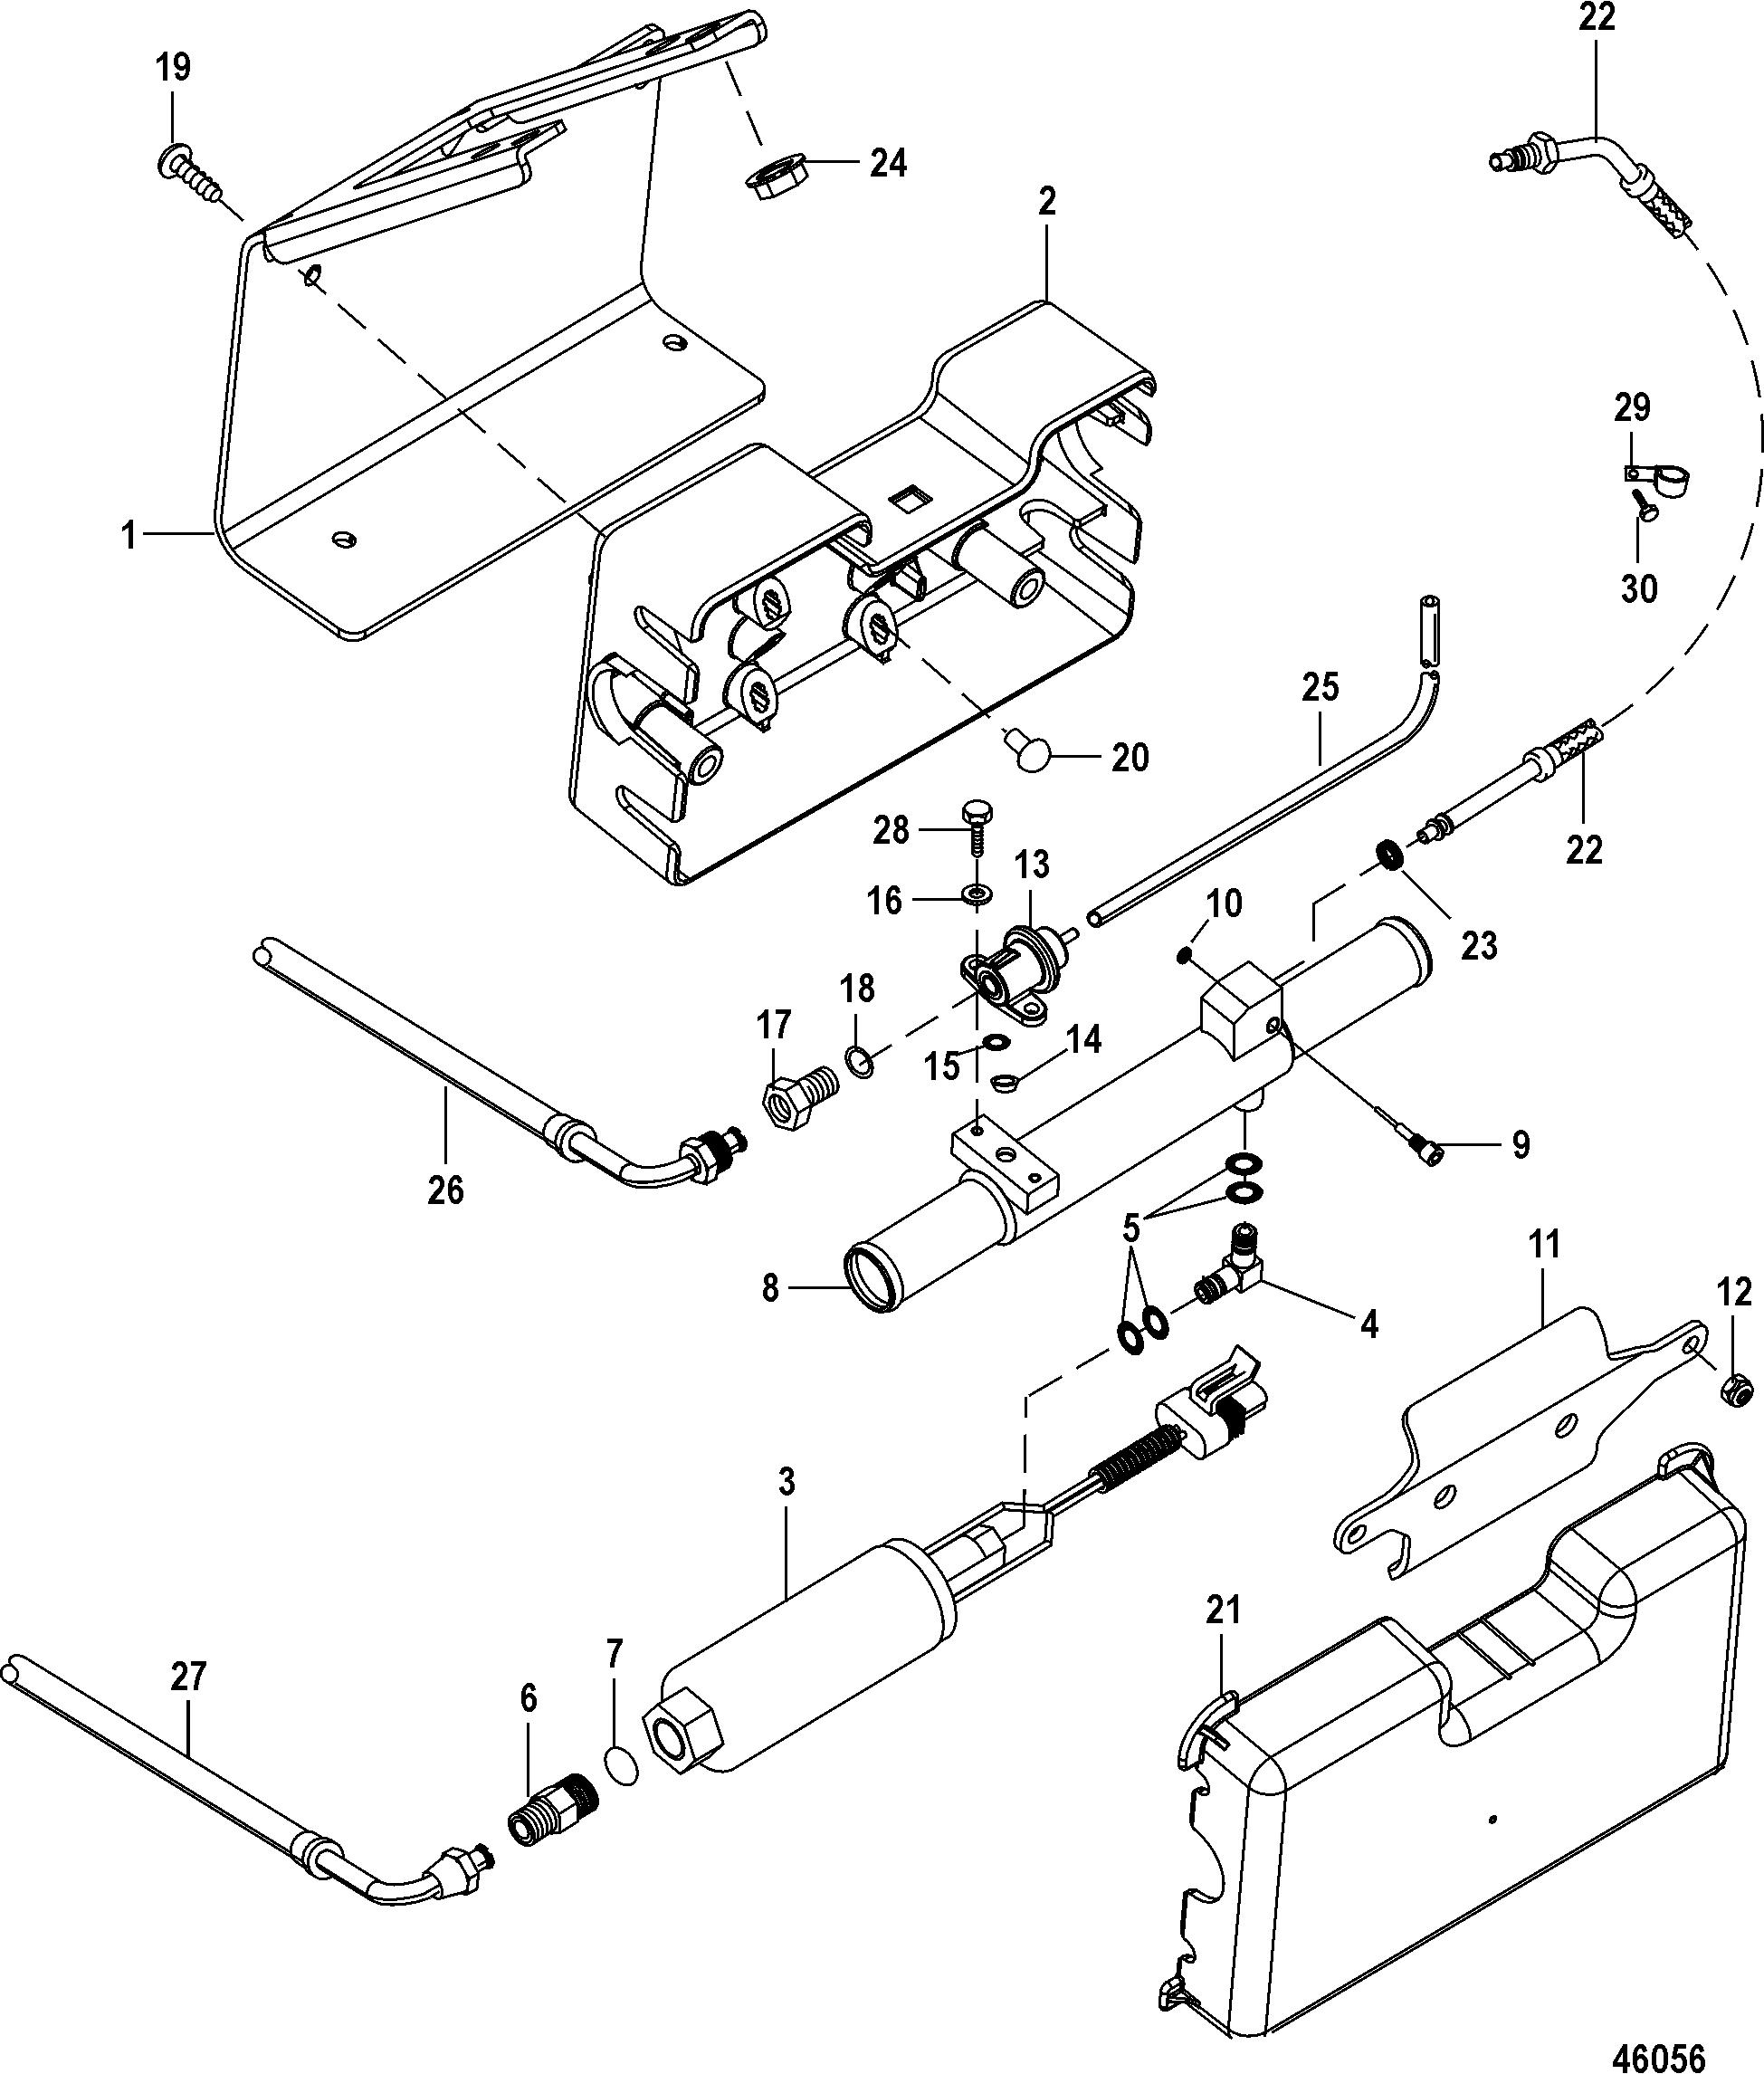 mercruiser 6 2l wiring diagram wiring diagram shrutiradio 46056?resize\\\\\\\u003d665%2C782\\\\\\\u0026ssl\\\\